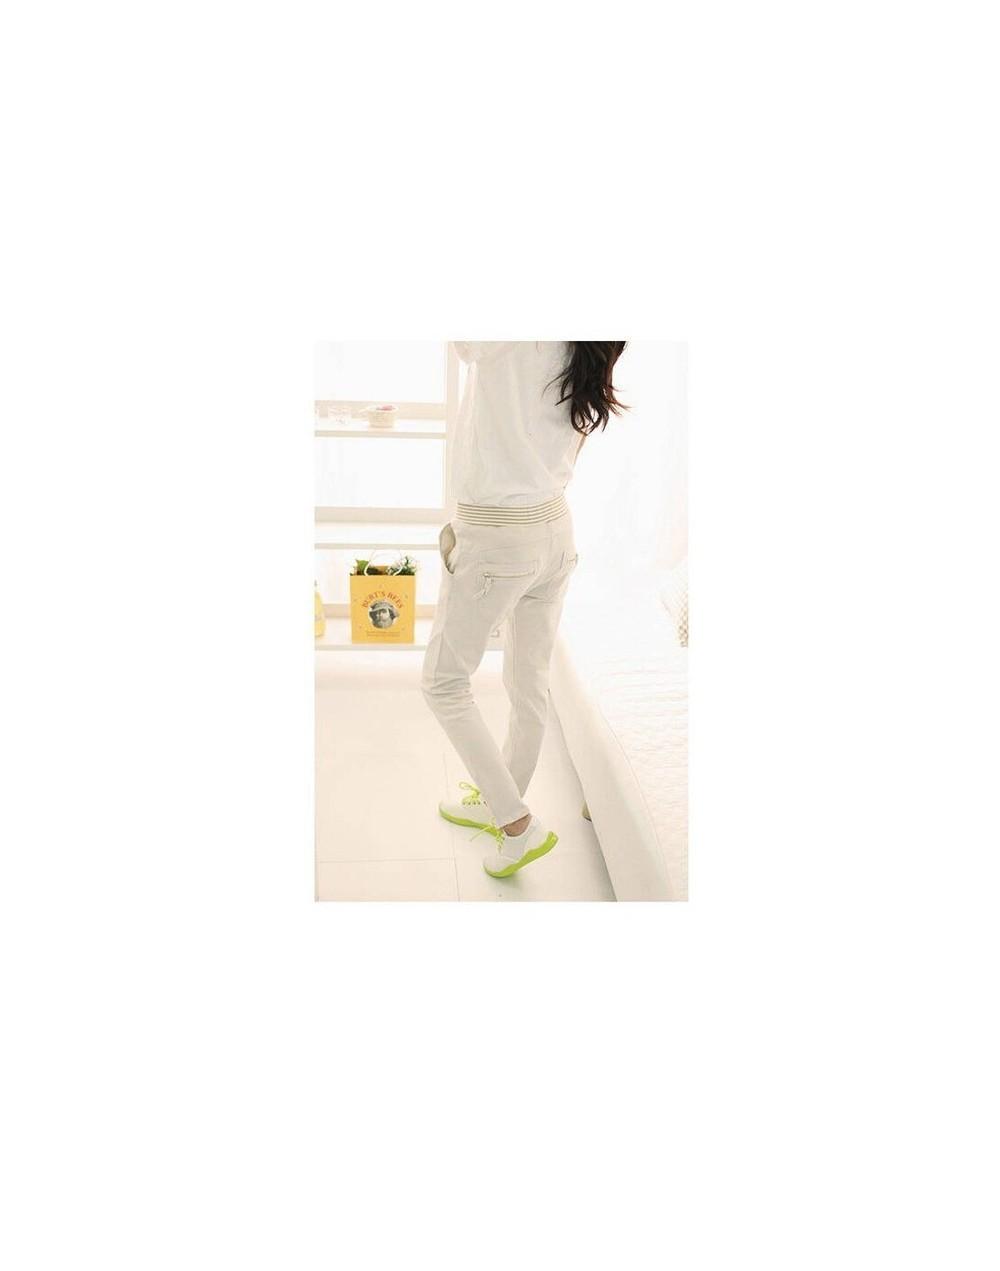 streetwear Harem pants trousers women linen leggings summer 2019 lady casual plus size stretch long slim pantalon femme - wh...